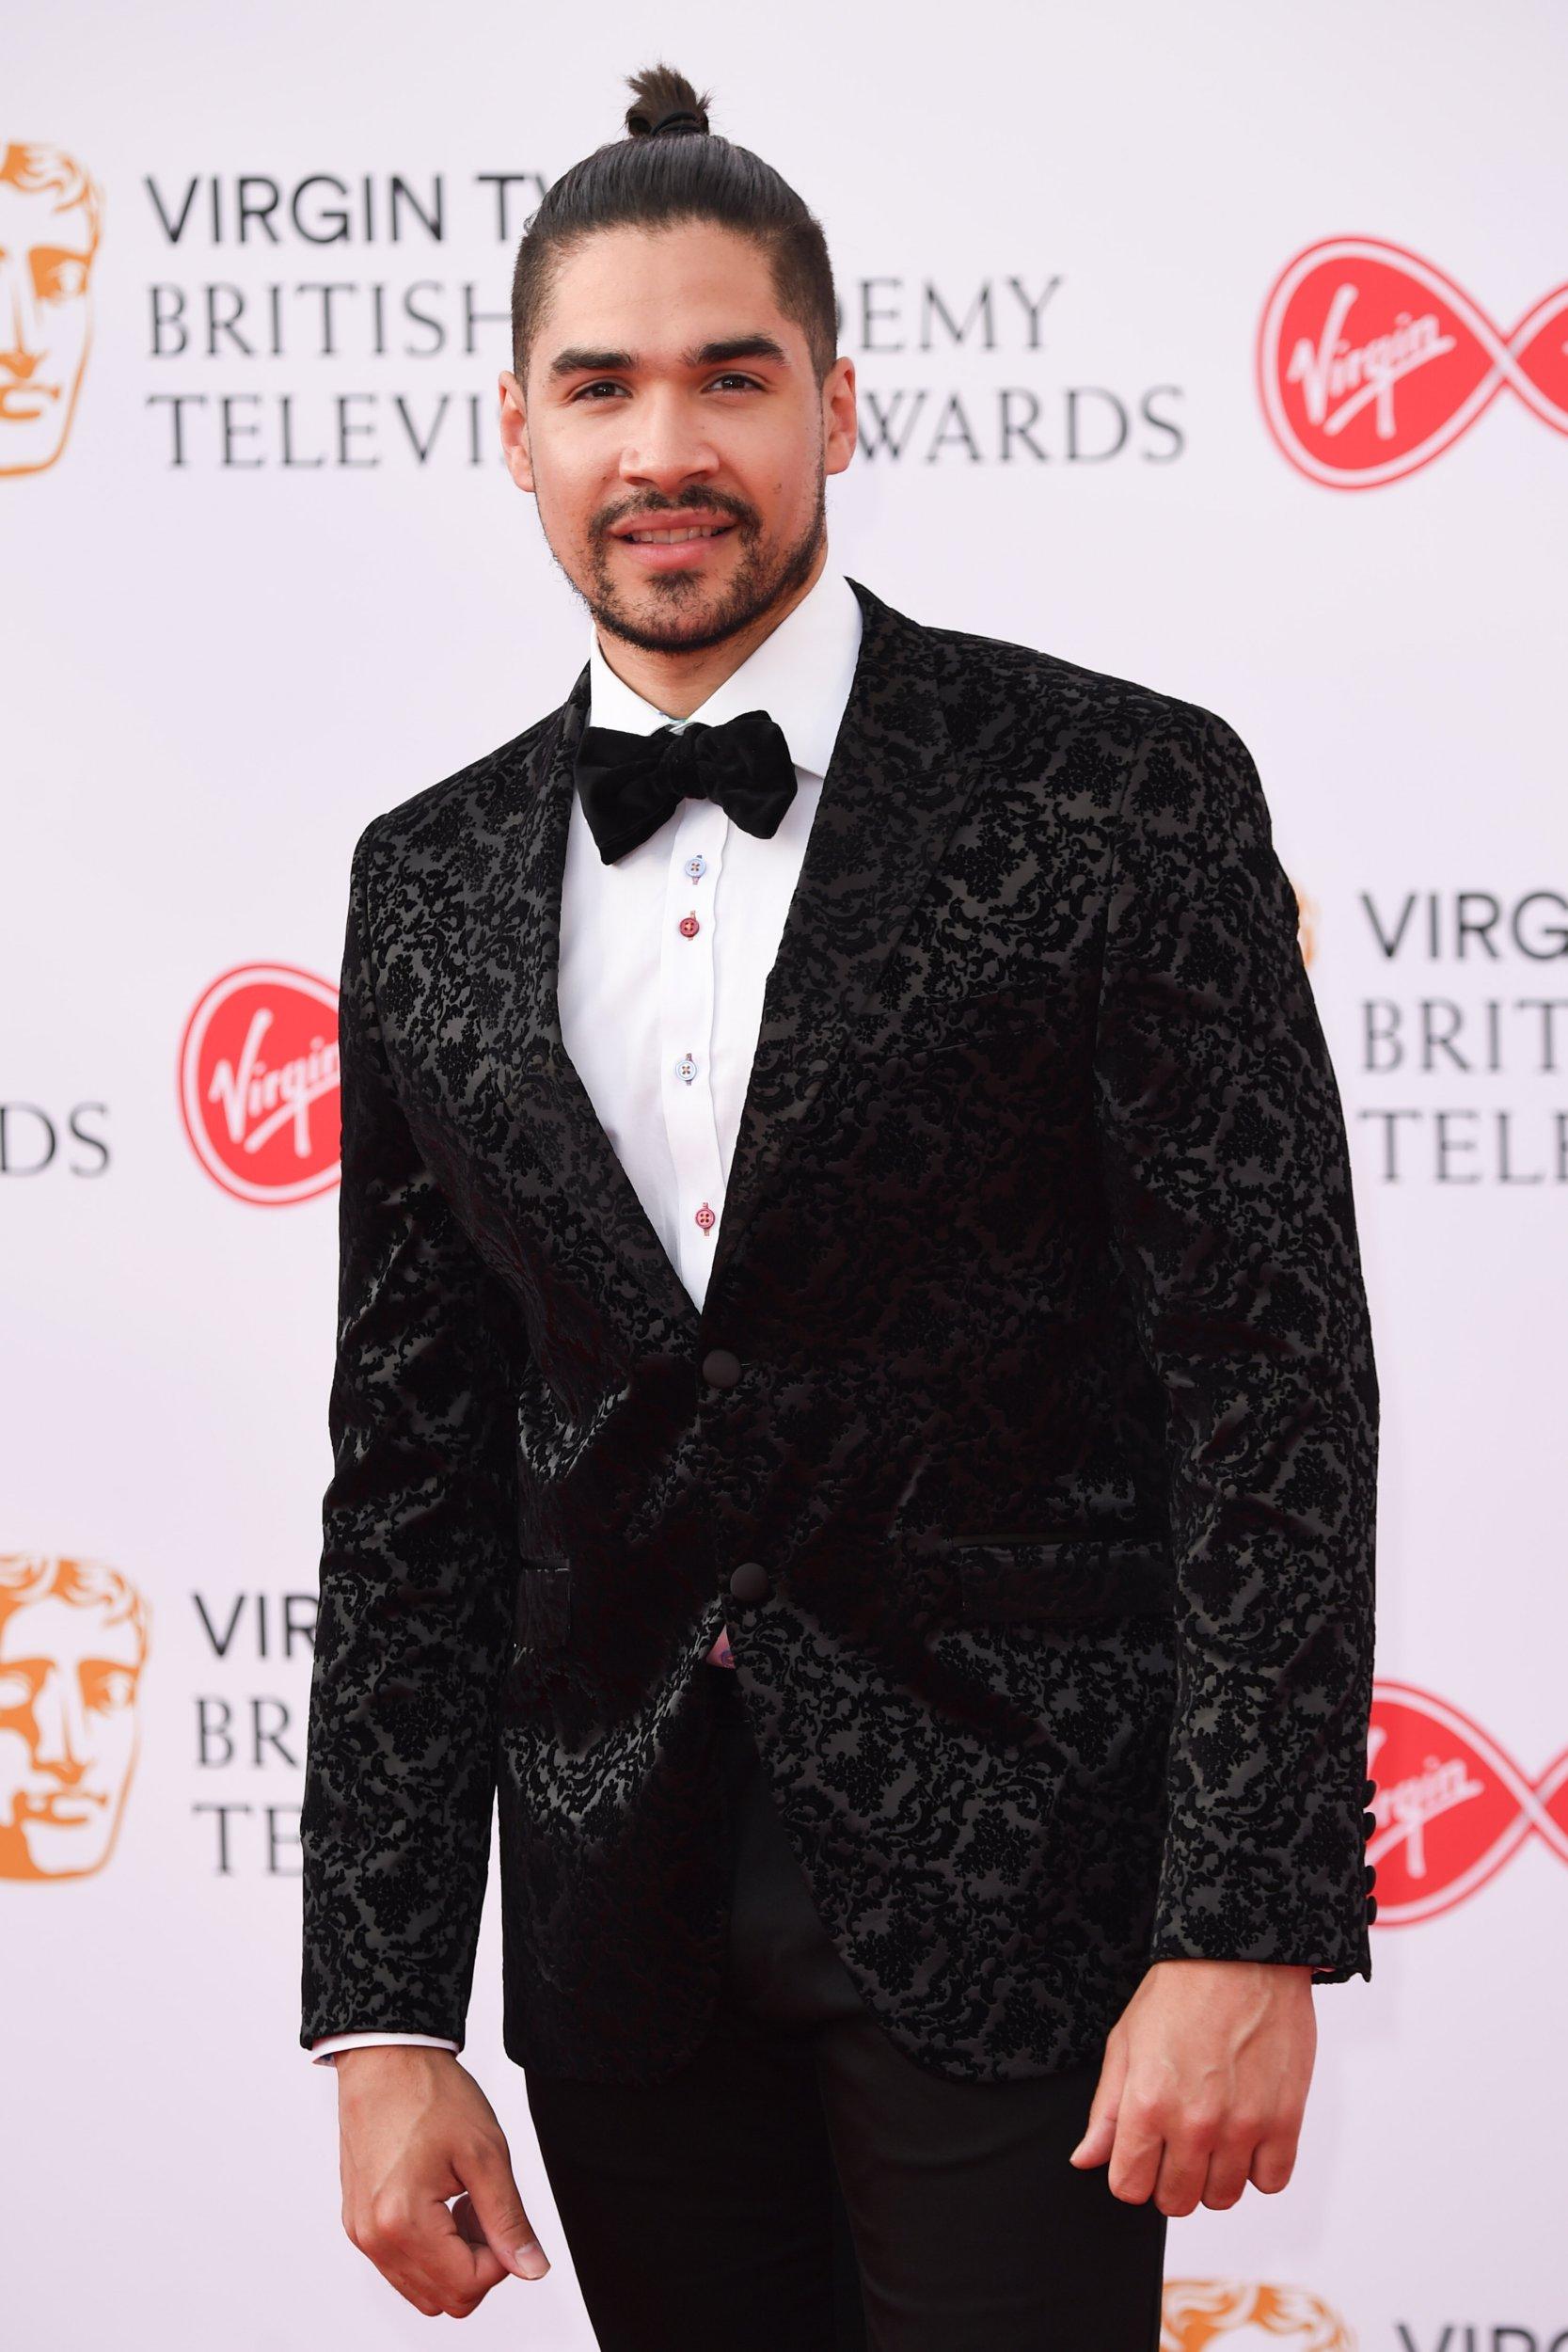 Mandatory Credit: Photo by FeatureflashSHM/REX/Shutterstock (9670754io) Louis Smith British Academy Television Awards, Arrivals, Royal Festival Hall, London, UK - 13 May 2018